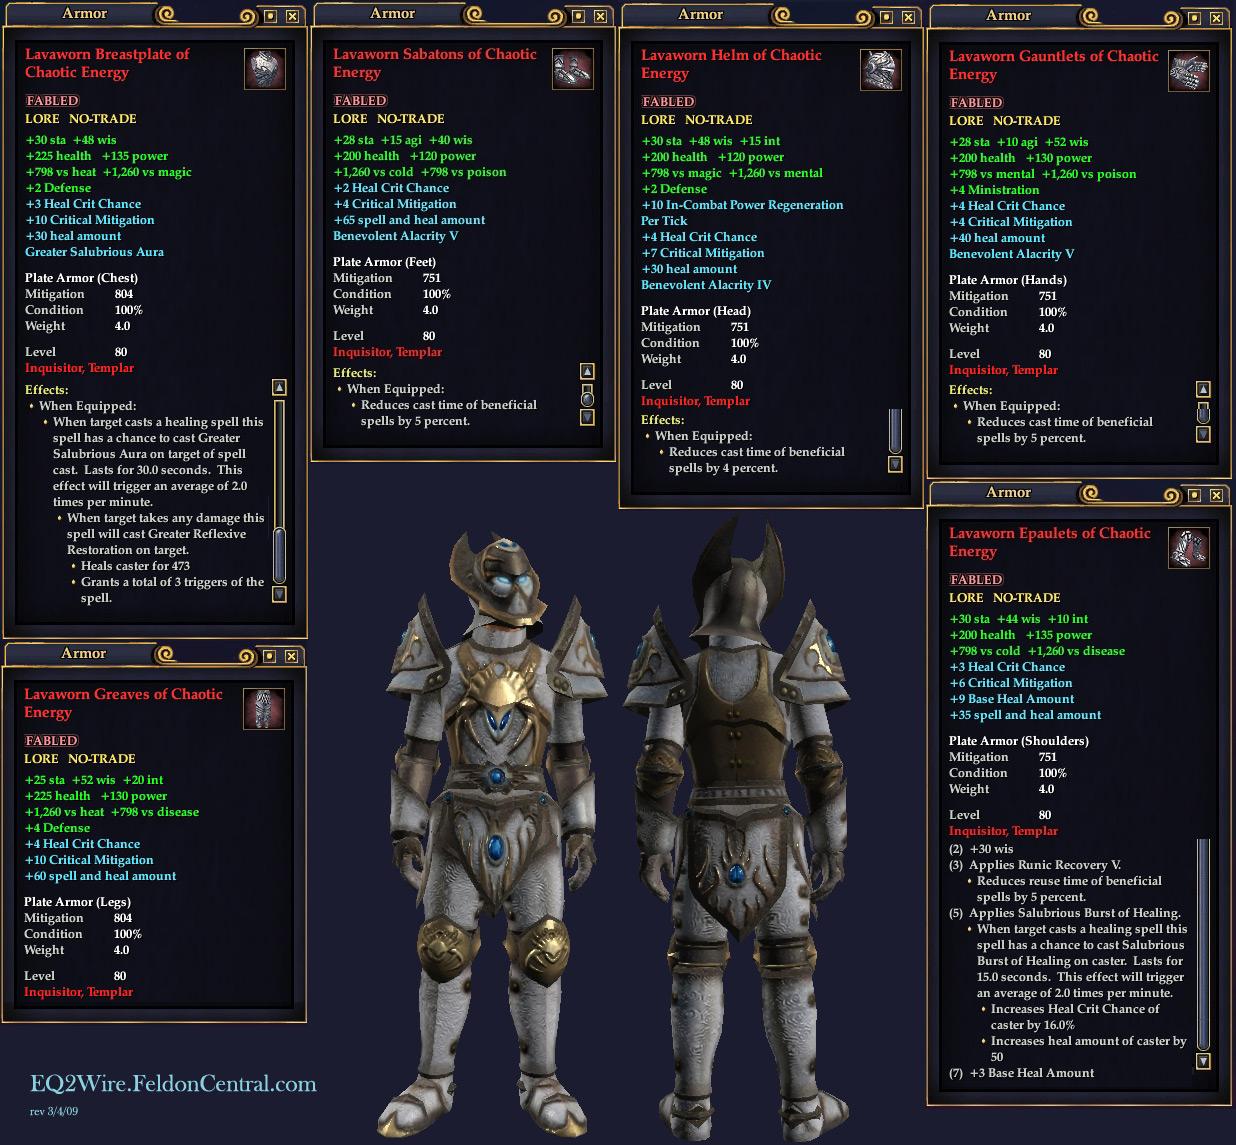 EQ2Wire » T3 Void Shard Armor Screen Shots